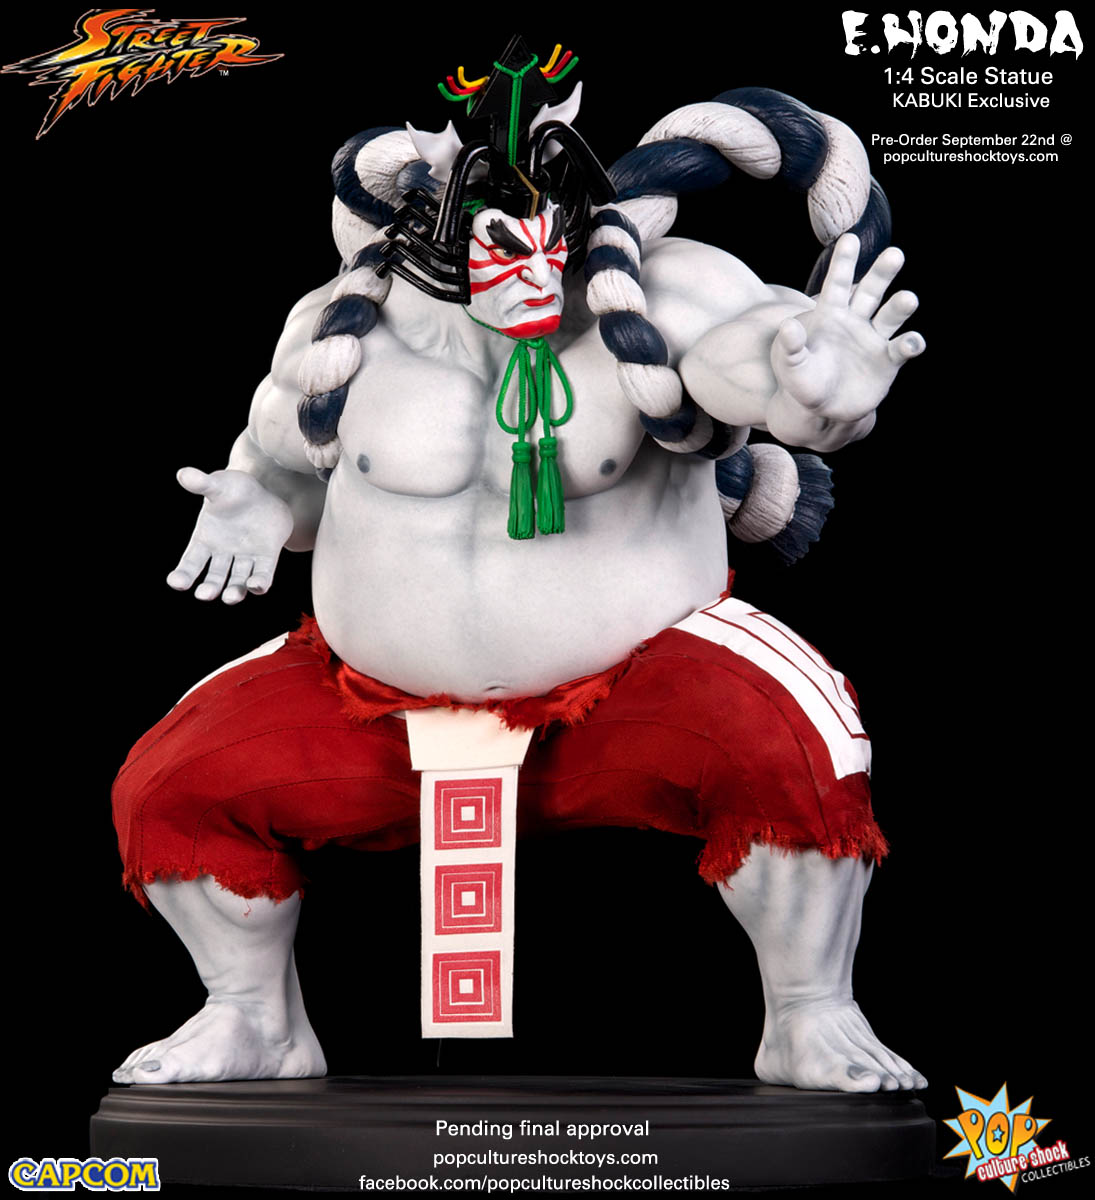 [Pop Culture Shock] Street Fighter: E. Honda 1/4 Statue - Página 3 Street-Fighter-E.-Honda-Kabuki-Statue-003